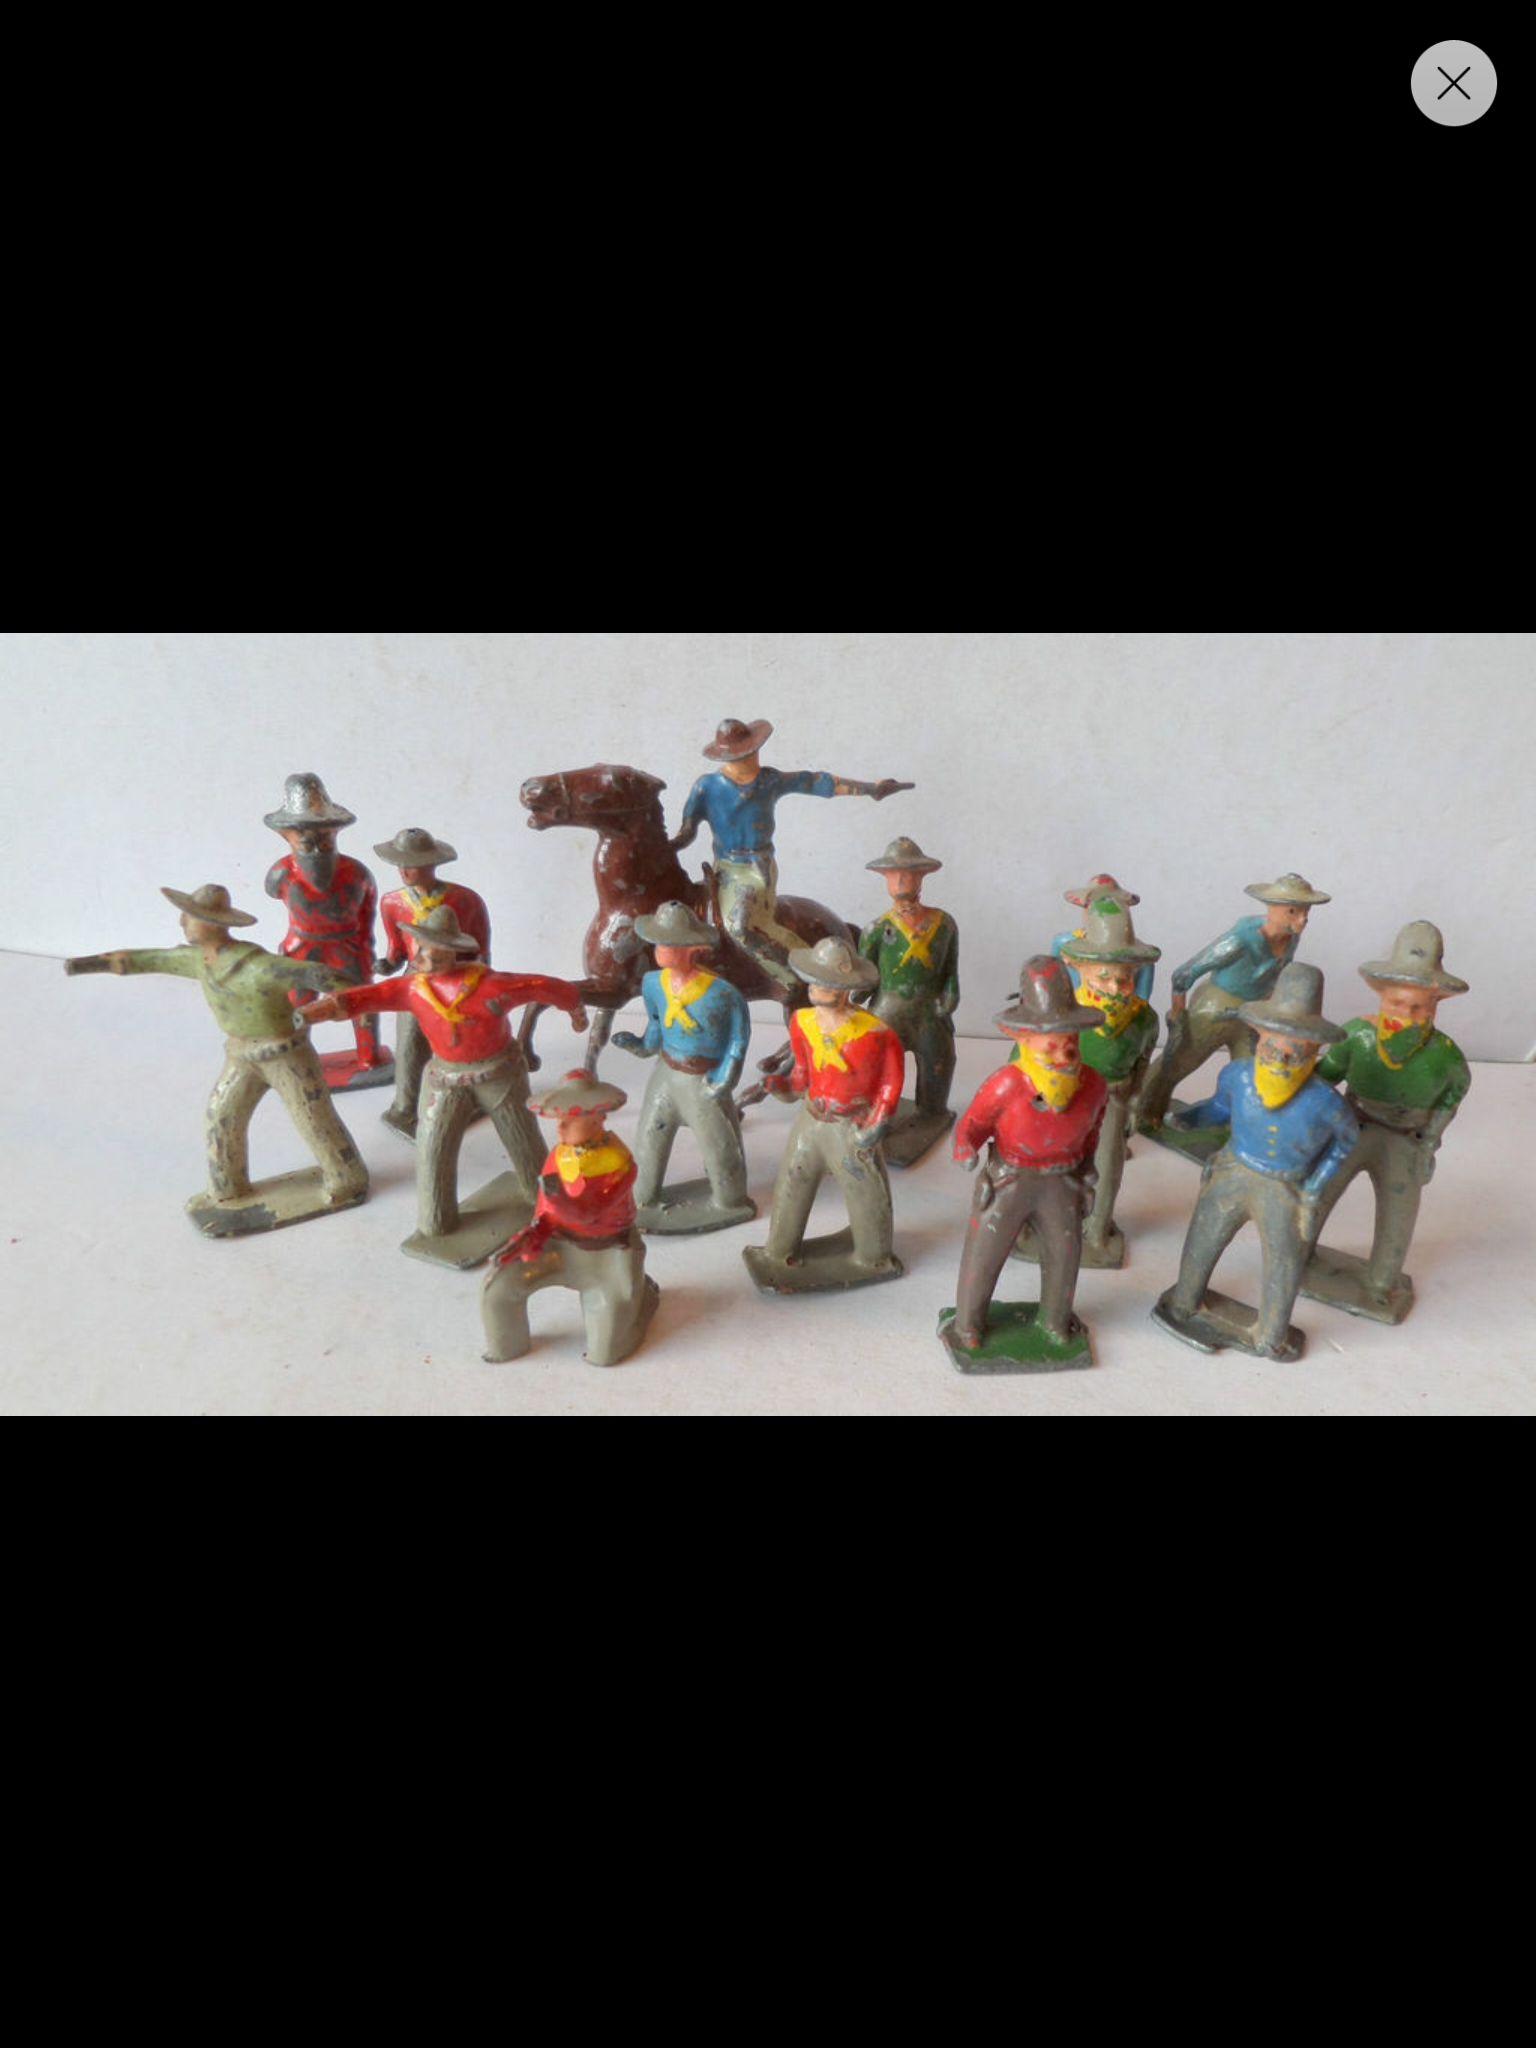 Soldat plomb cowboys lead toys vintage